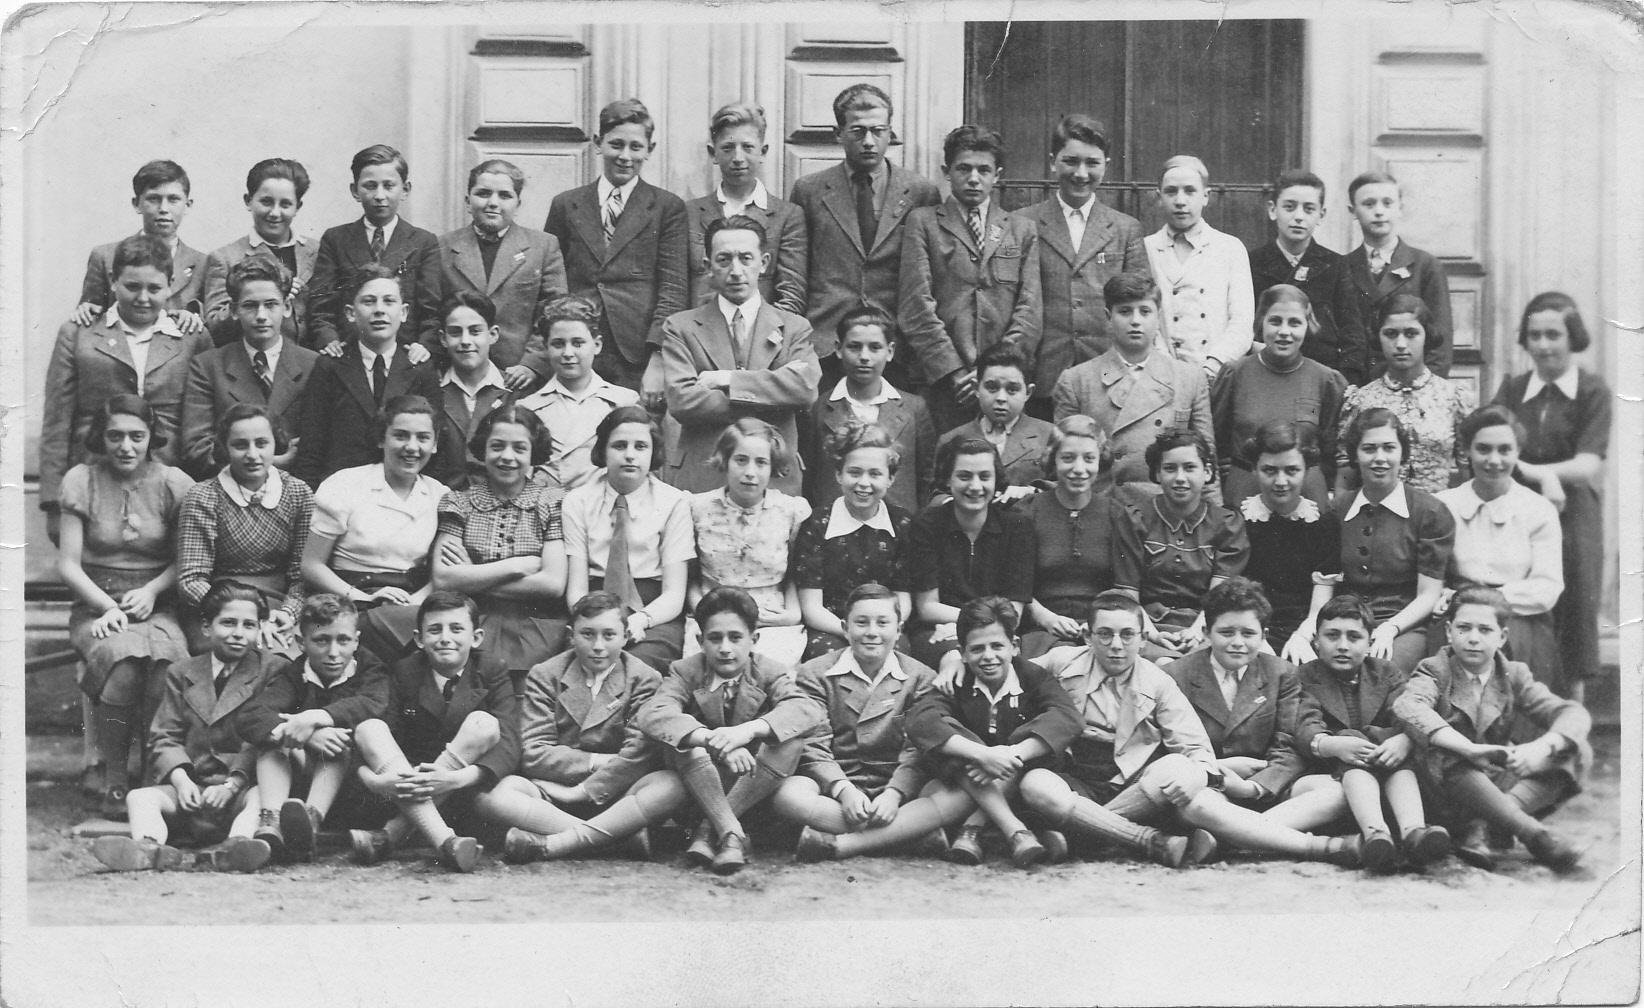 3. tř. 1937/38 horní řada: Karel Fischer, Kurt Schön, ?, Harry Ast, Erich Reiss, Adolf Goldmann,?, ?, ?, ?, ?, Herbert Deresiewicz 2. řada: Jedidjah Grünfeld, František Spitzer, ?, ?, ?, prof. Leopold Schnitzler, ?, Kurt Jellinek, Oskar Beer, Ida Gottlobová, ?, Martha Taussová 3. řada: ?, ?, ?, ?, ?, ?, ?, ?, Gerda Meiselová, Stella Baruová, Lydia Schönová, ?, ? sedící dole: Jiří Hochberger, Wolfgang Reinhold, Erich Gelbkopf, ?, Kurt Baum, ?, Gideon Goldschmied, ?, ?, ?, ?